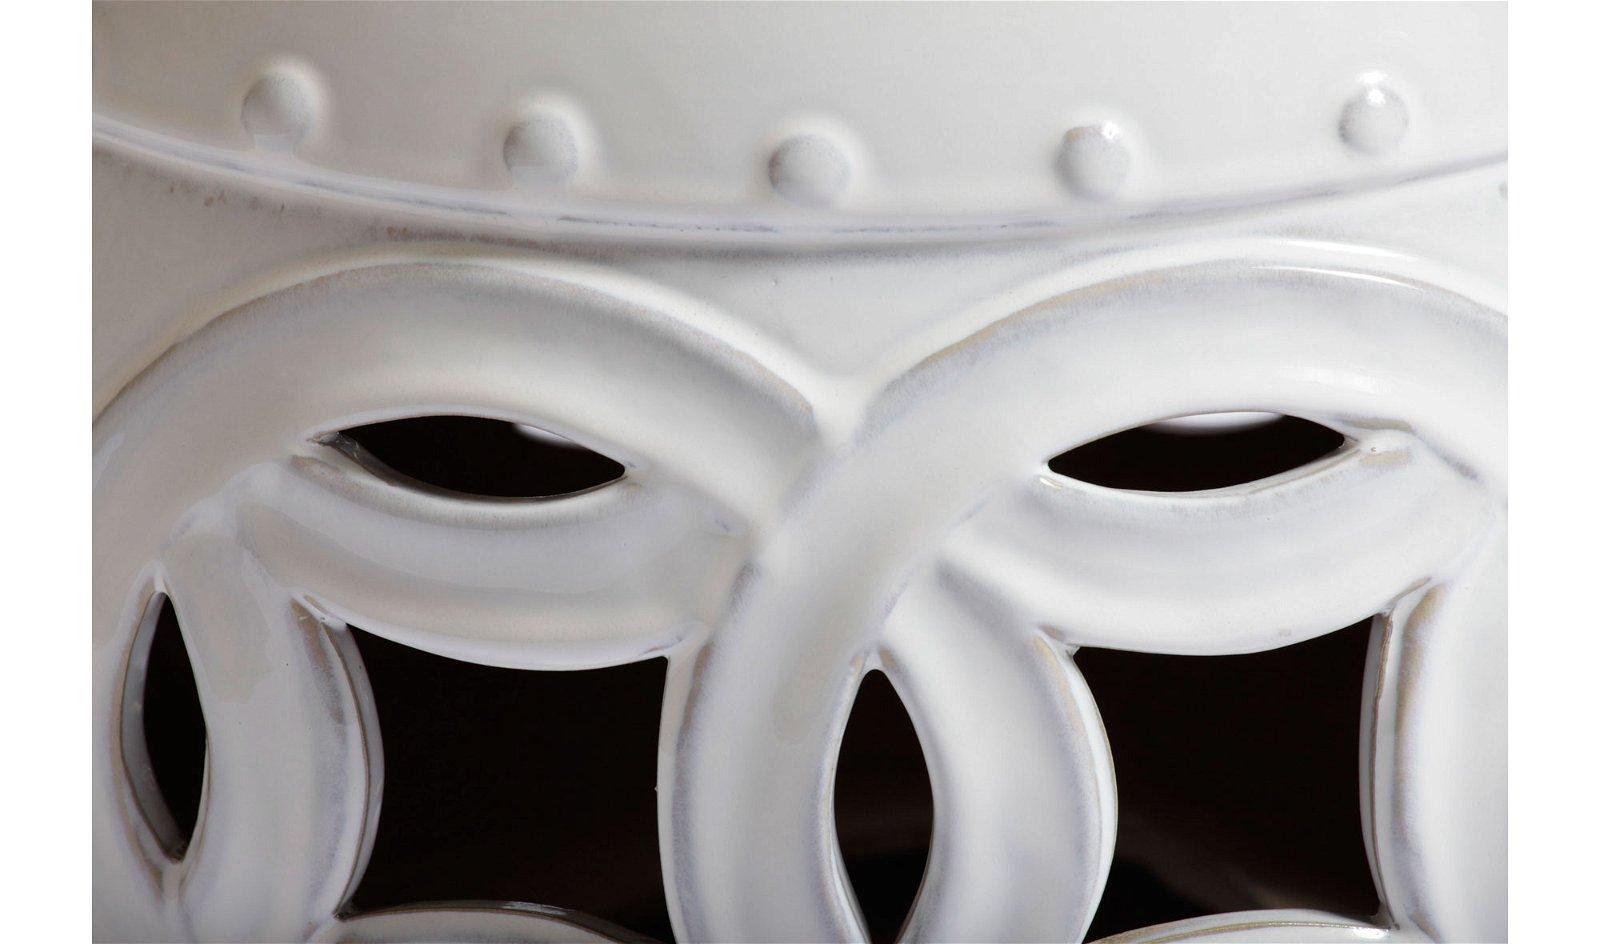 Taburete cerámico bajo blanco